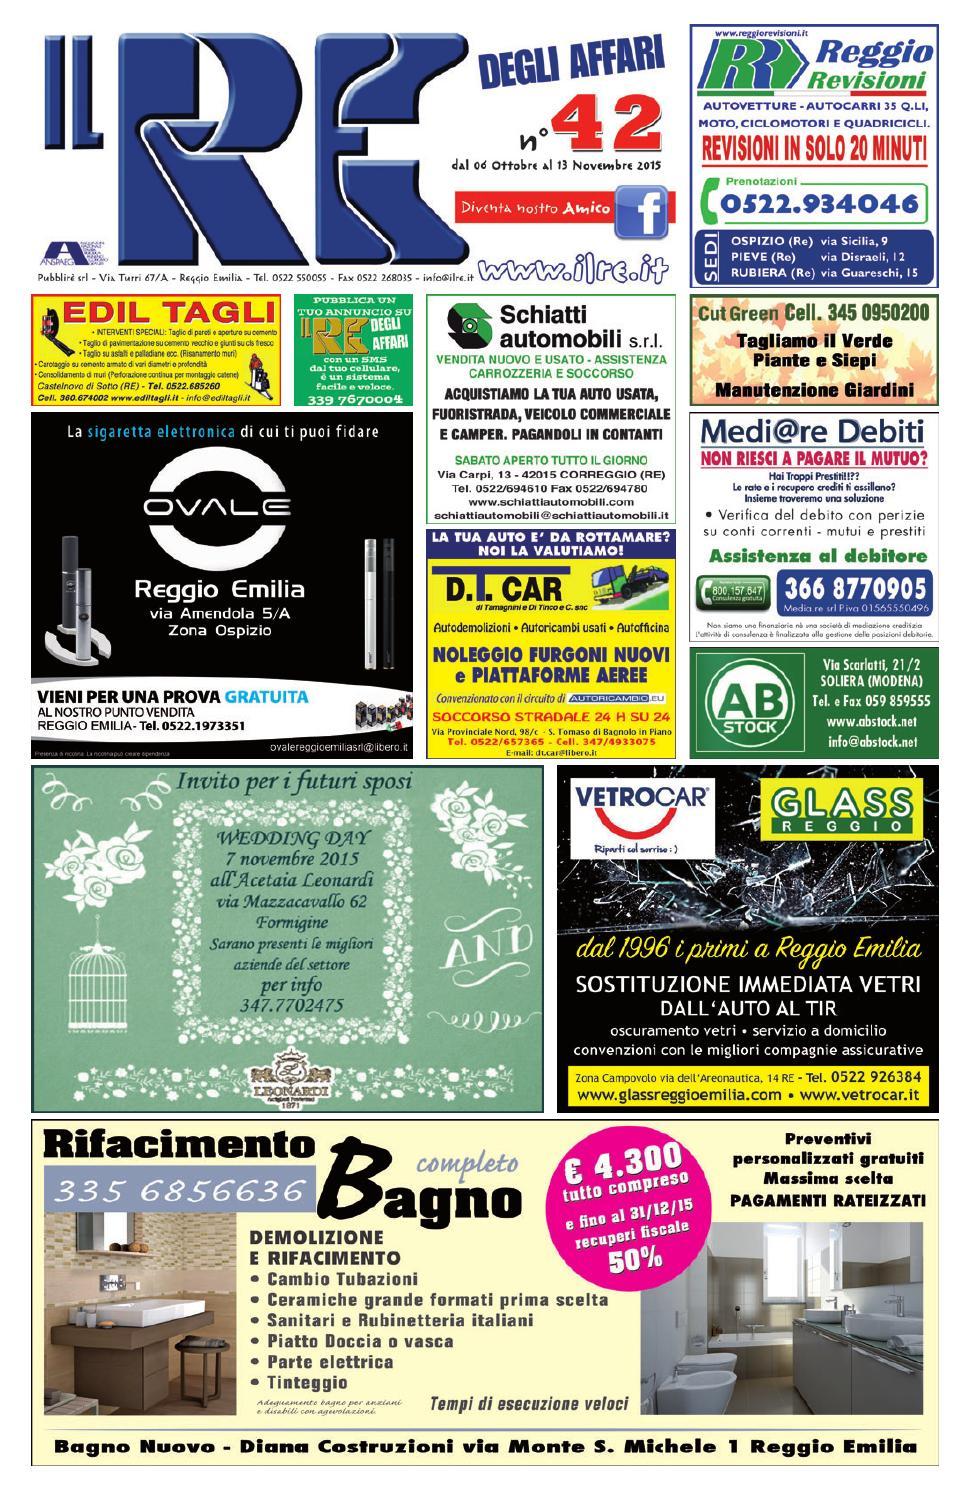 reputable site 4da23 bdaf0 IL RE DEGLI AFFARI NR. 42 2015 by Il Re degli Affari - issuu